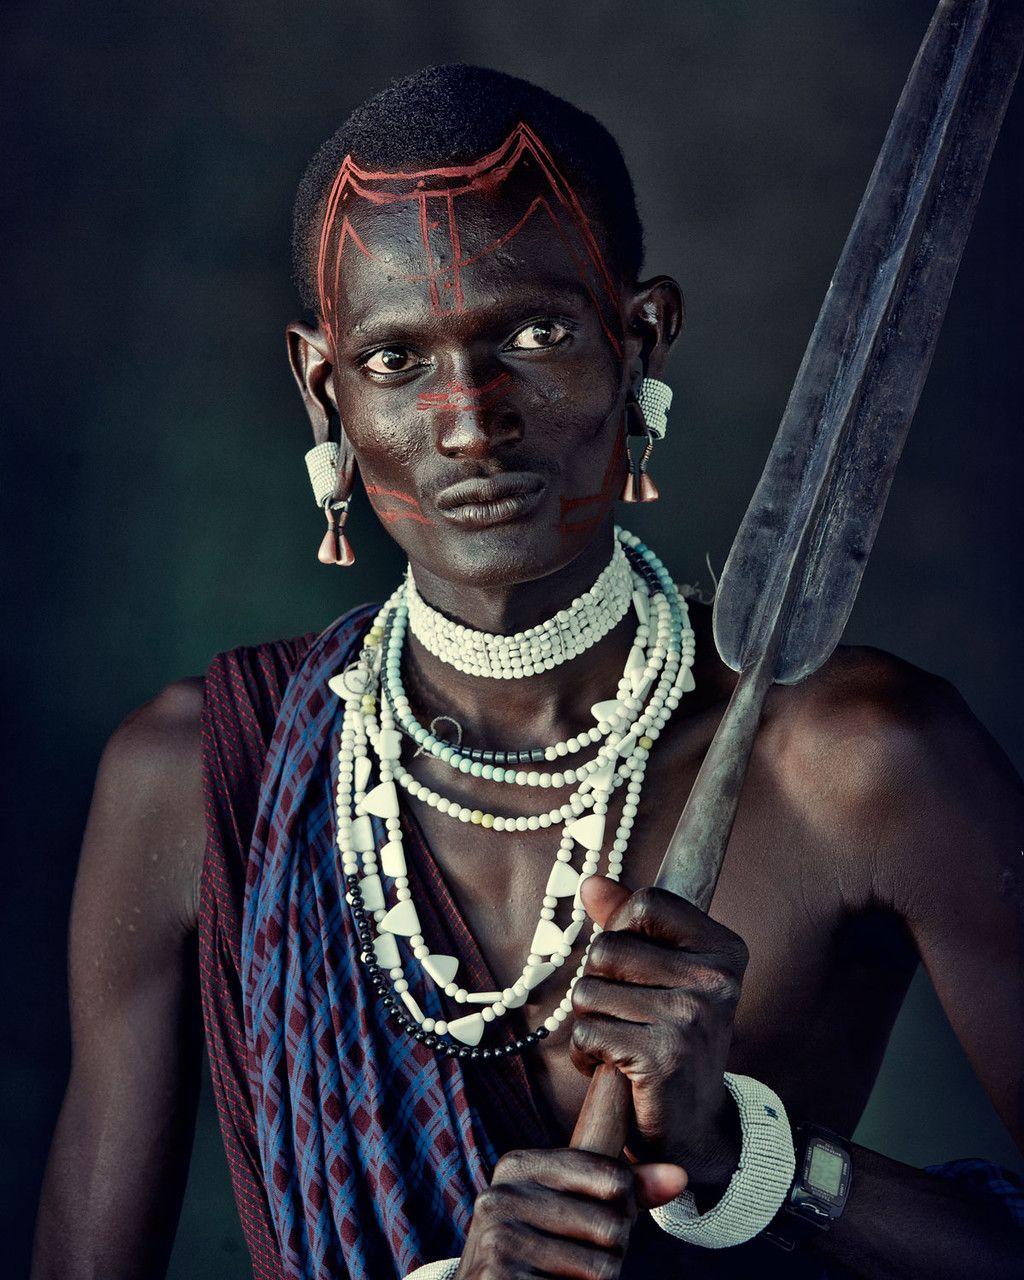 Африканские мужчины картинки